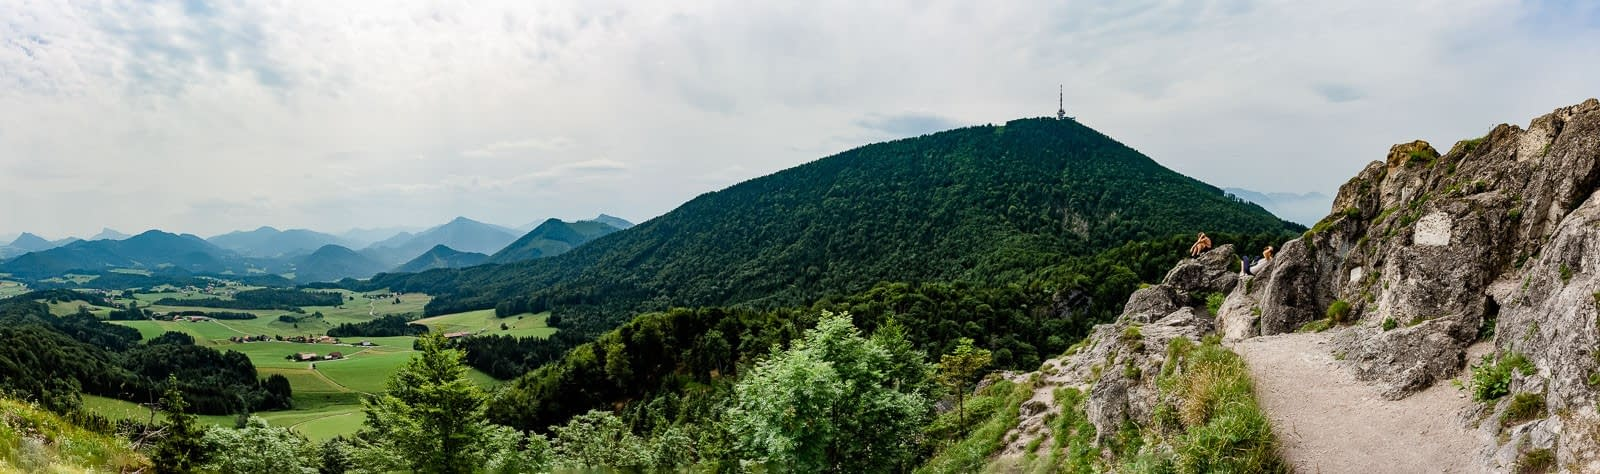 Panorama Nockstein